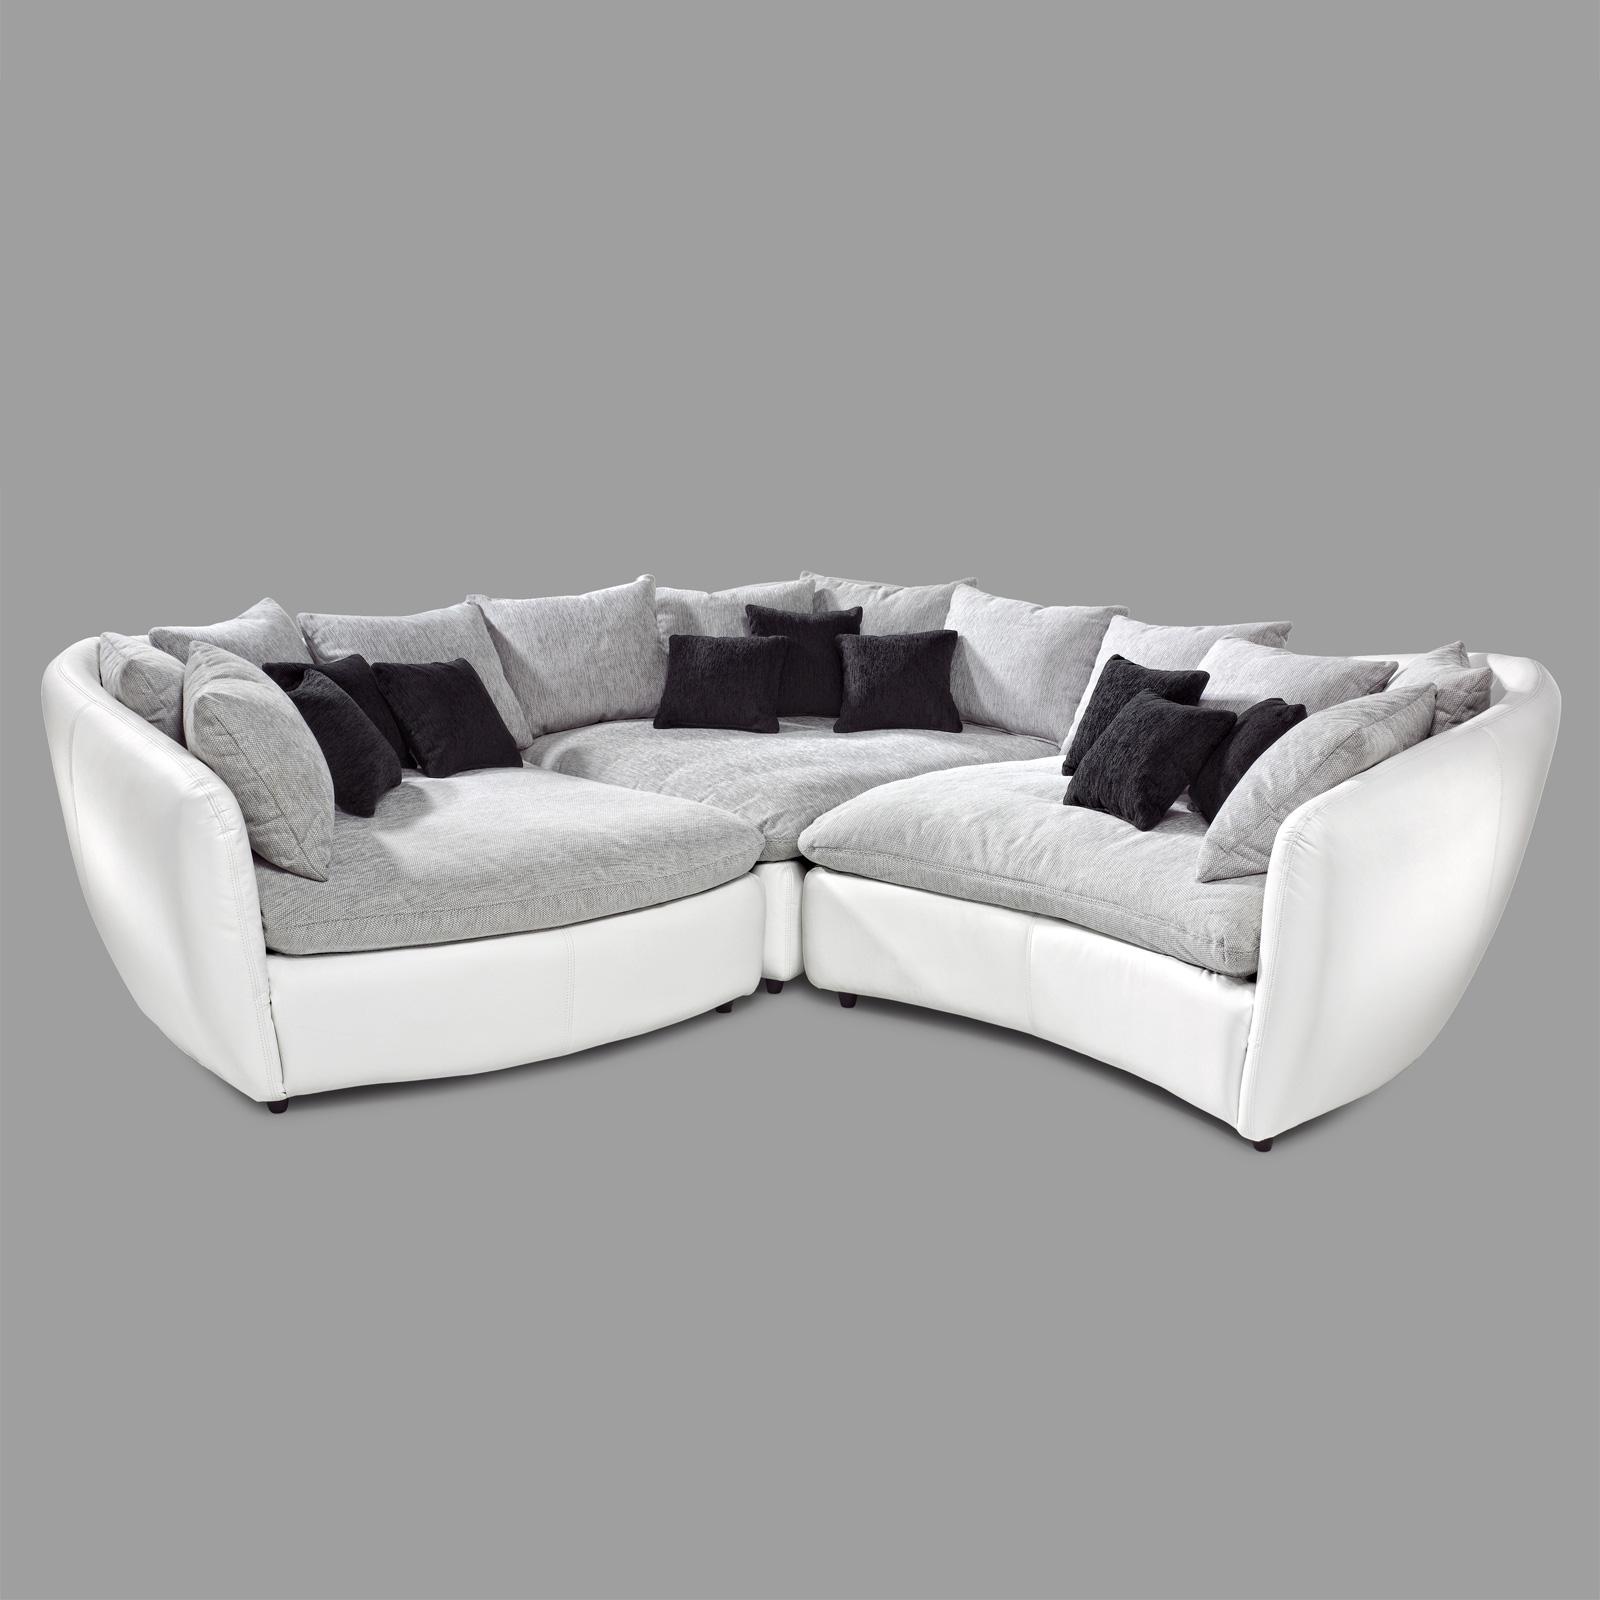 ecksofa tunis eckkombi bigsofa sofa polsterecke wei grau und schwarz ebay. Black Bedroom Furniture Sets. Home Design Ideas